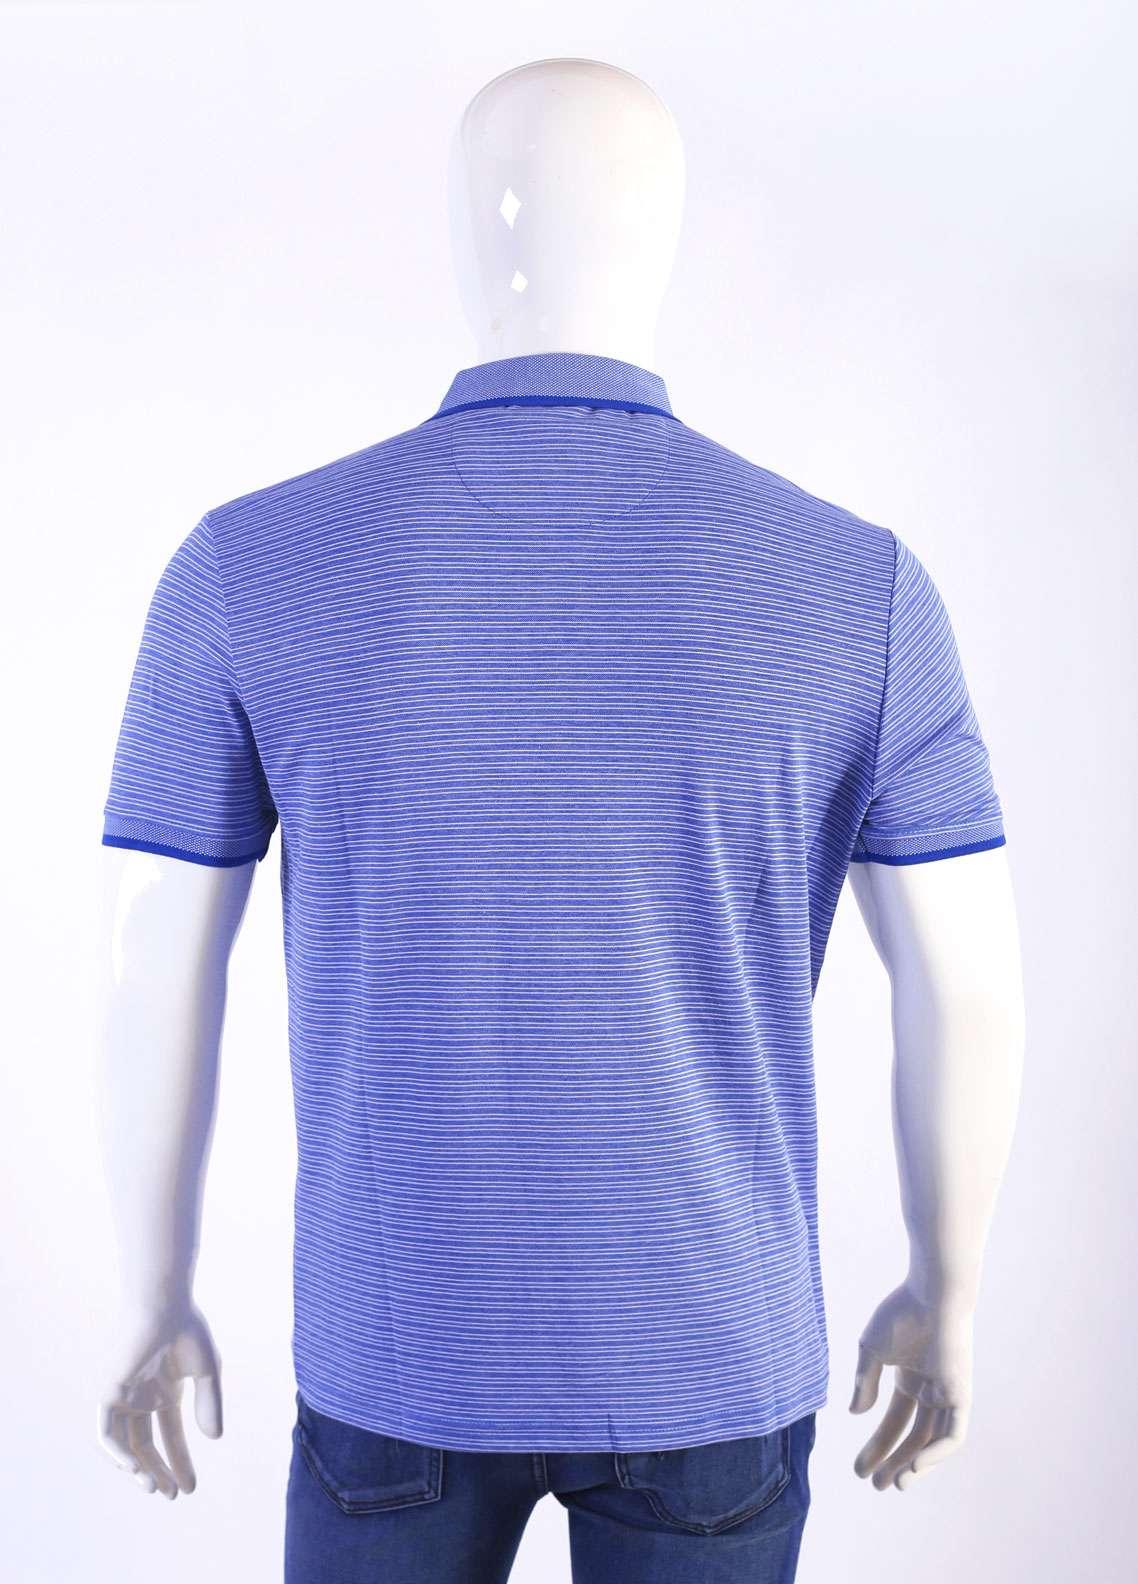 Sanaulla Exclusive Range Jersey Polo Men T-Shirts - Sky Blue TKM18S 361-04